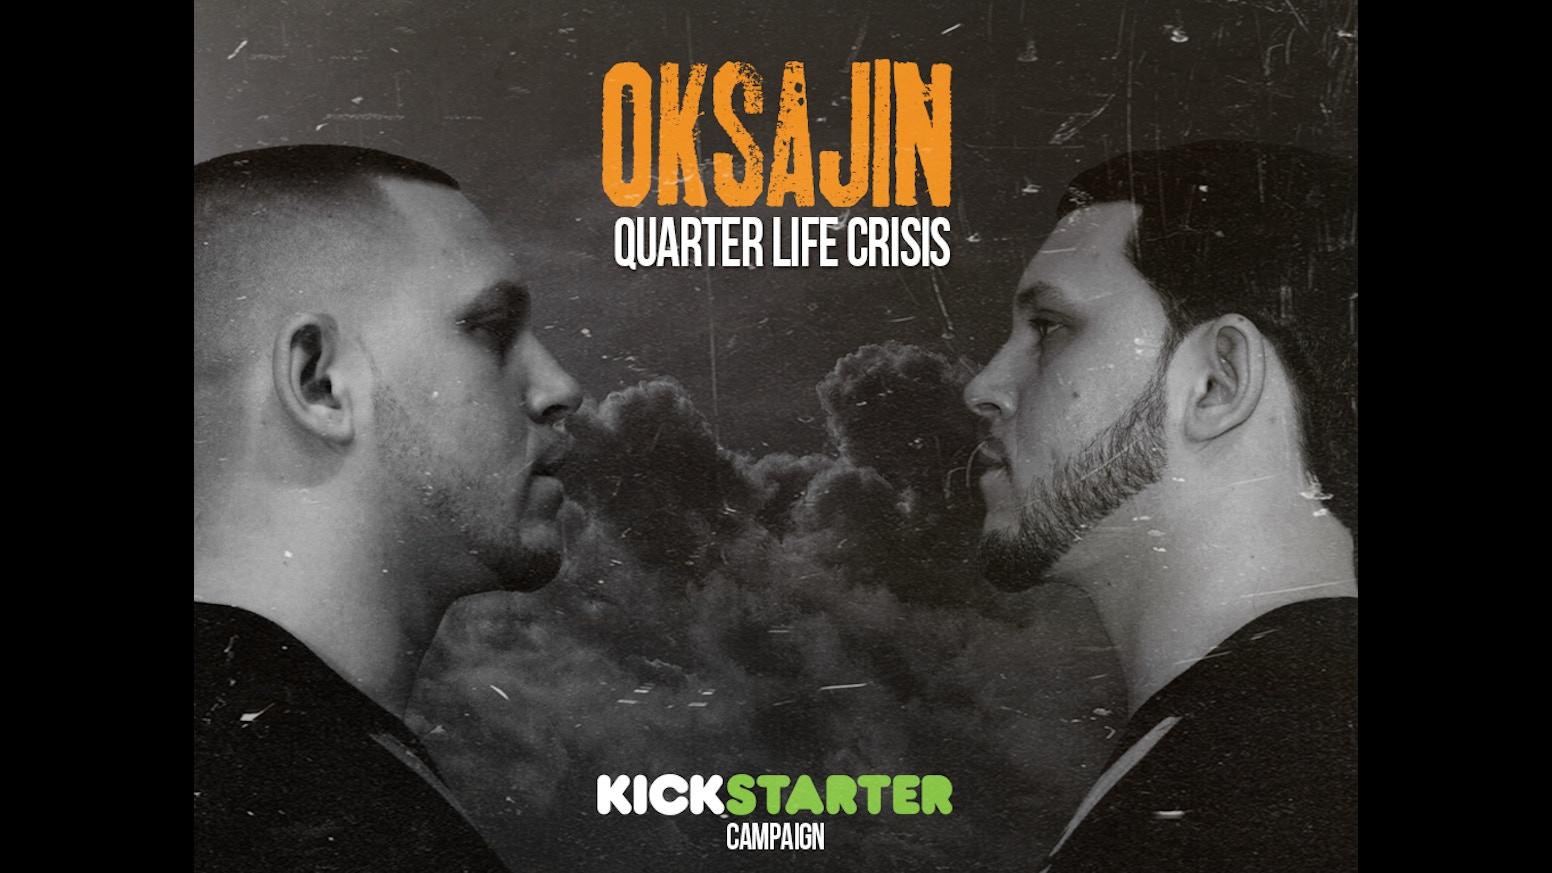 oksajin quarter life crisis album produced by roadsart by oksajin quarter life crisis album produced by roadsart